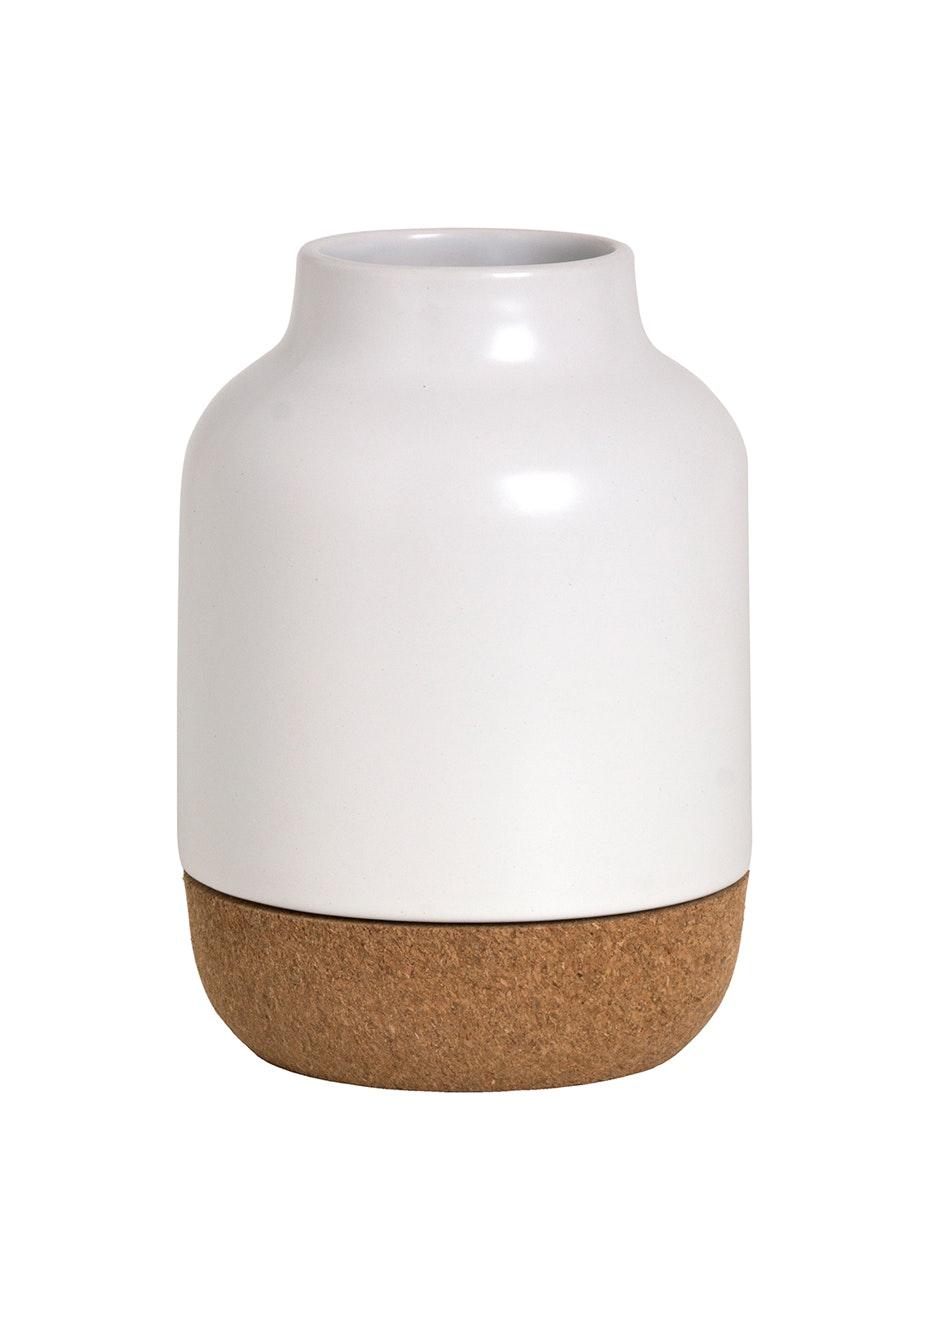 Cork Base Vase - White/Cork